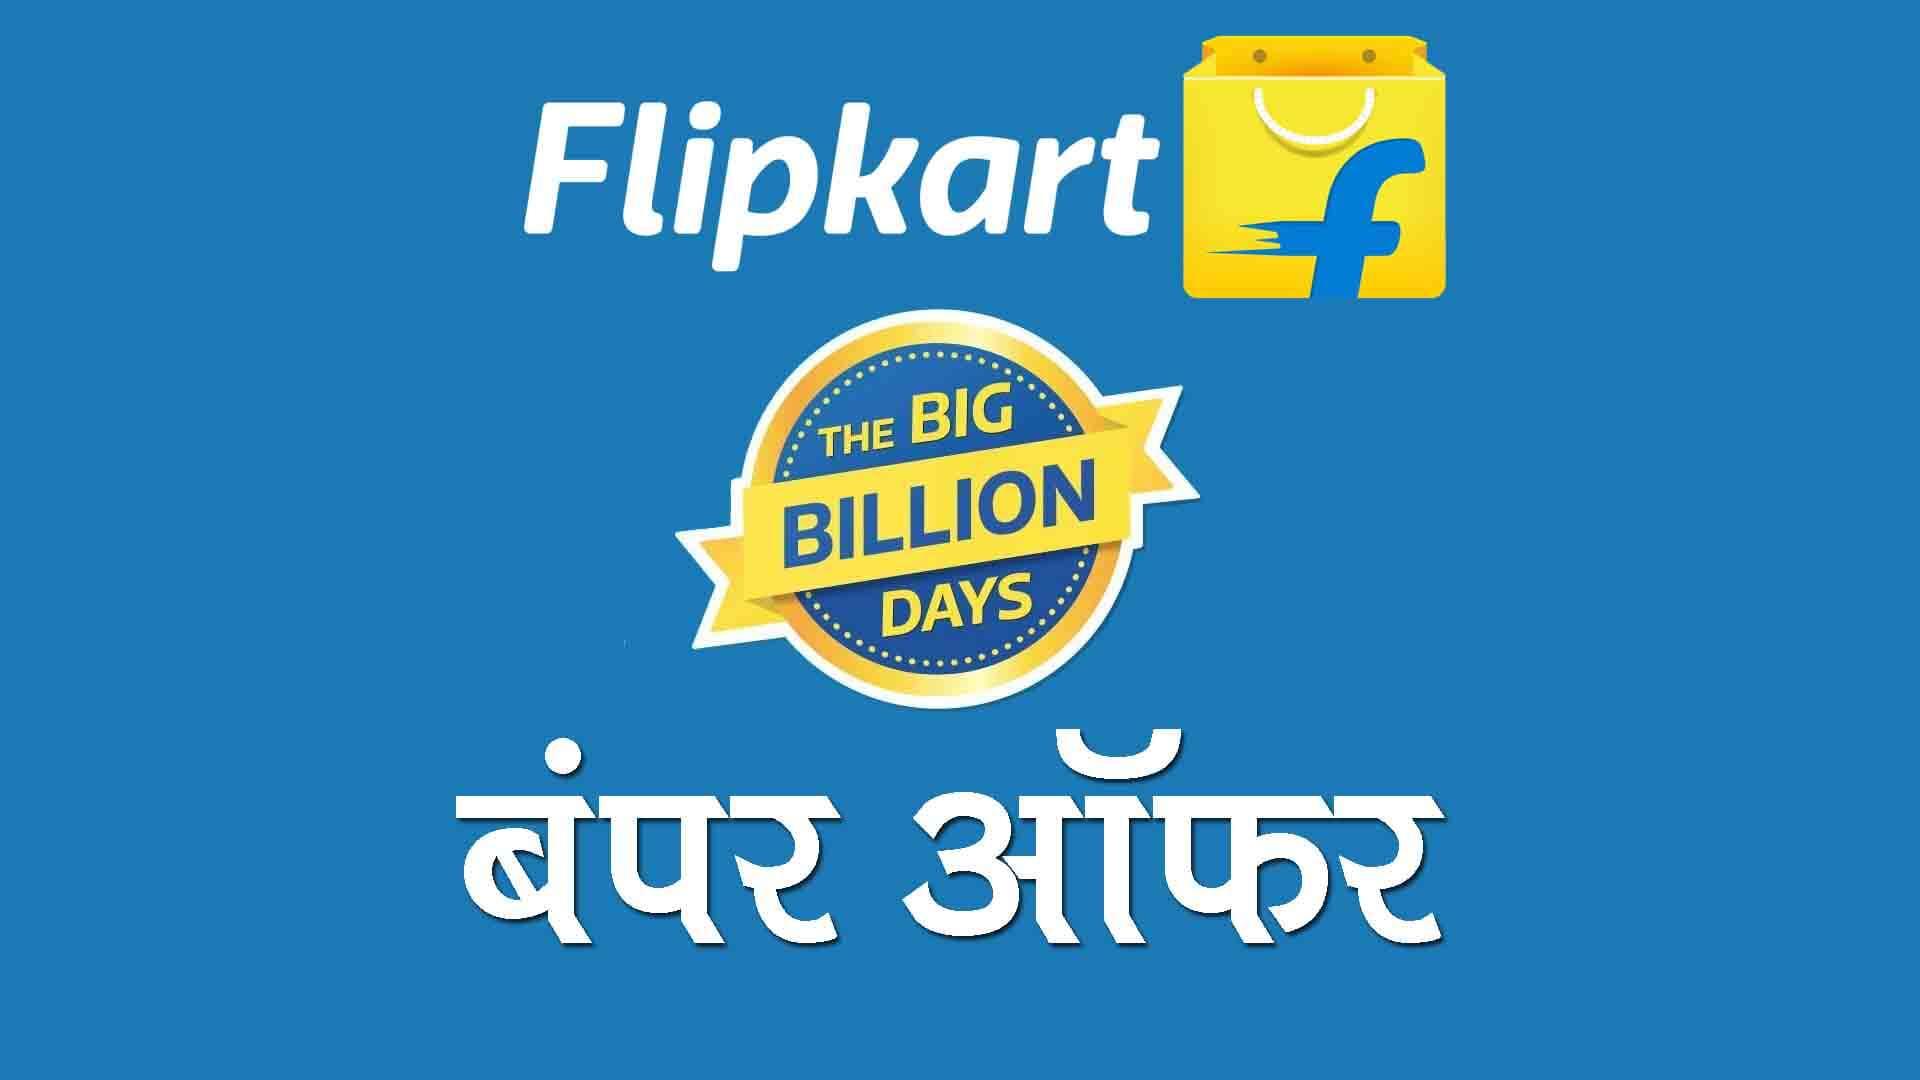 big billion day flipkart 2019 date